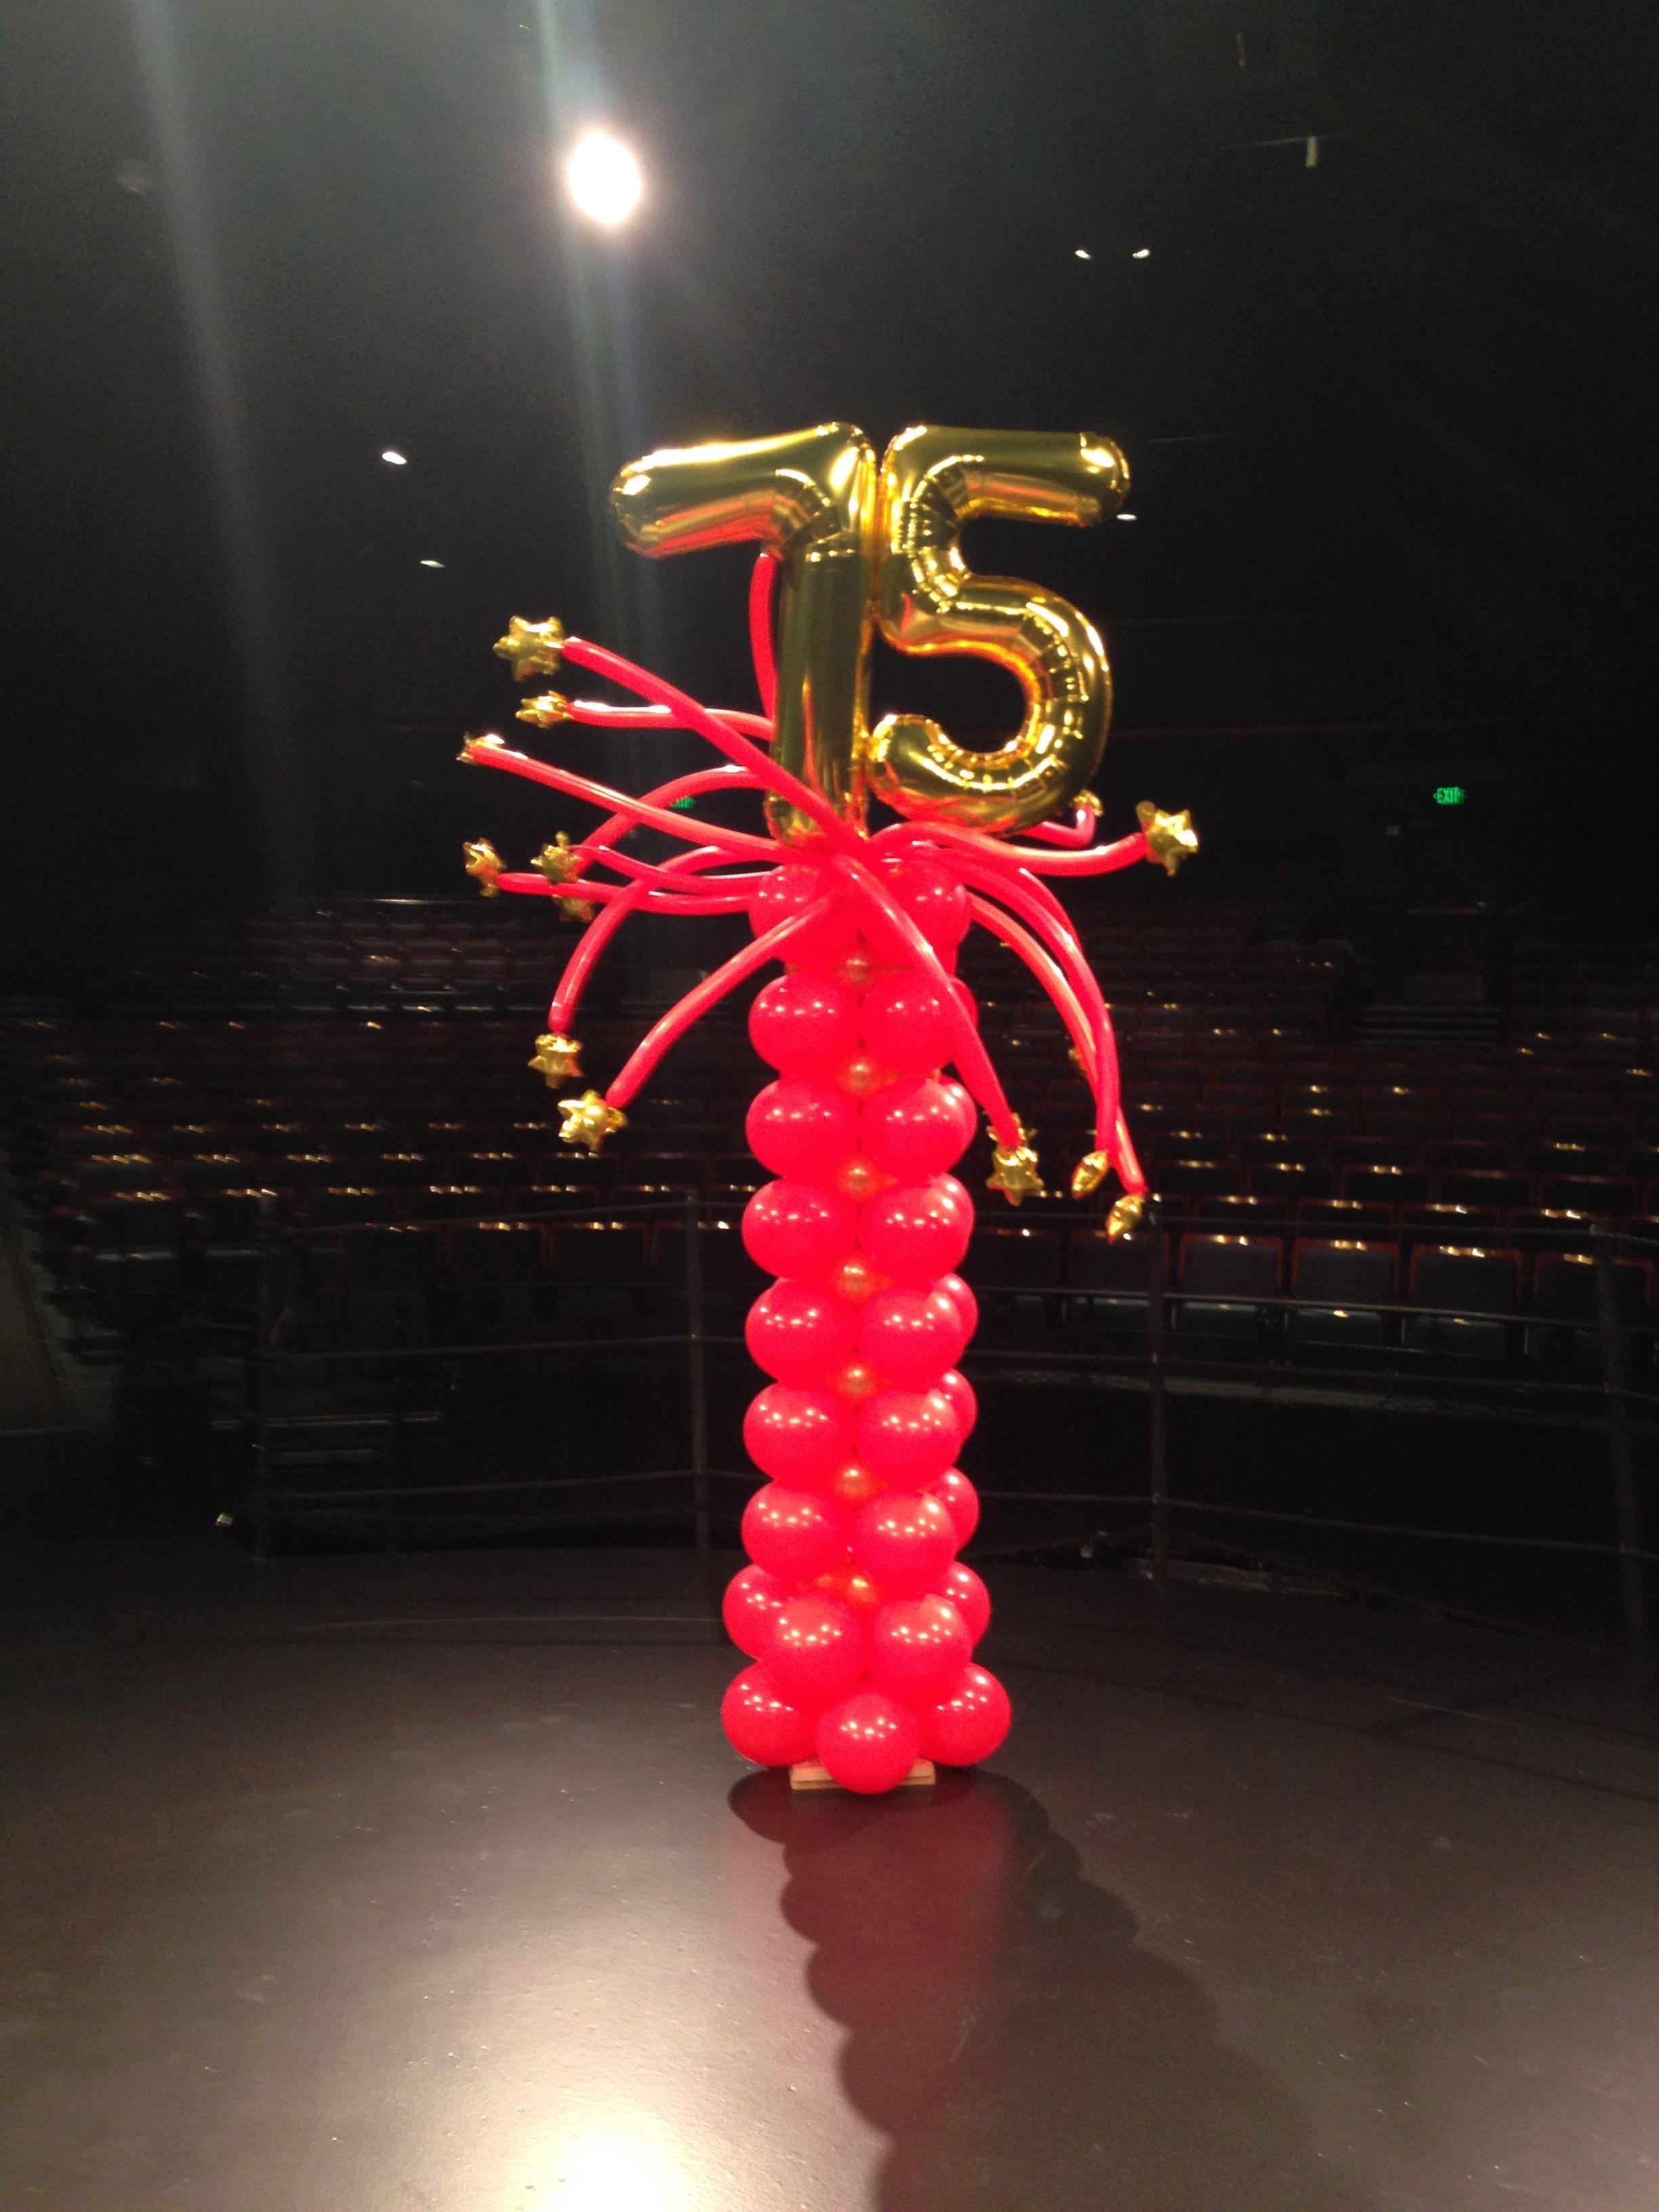 Balloon pillars for a 75th anniversary event balloon